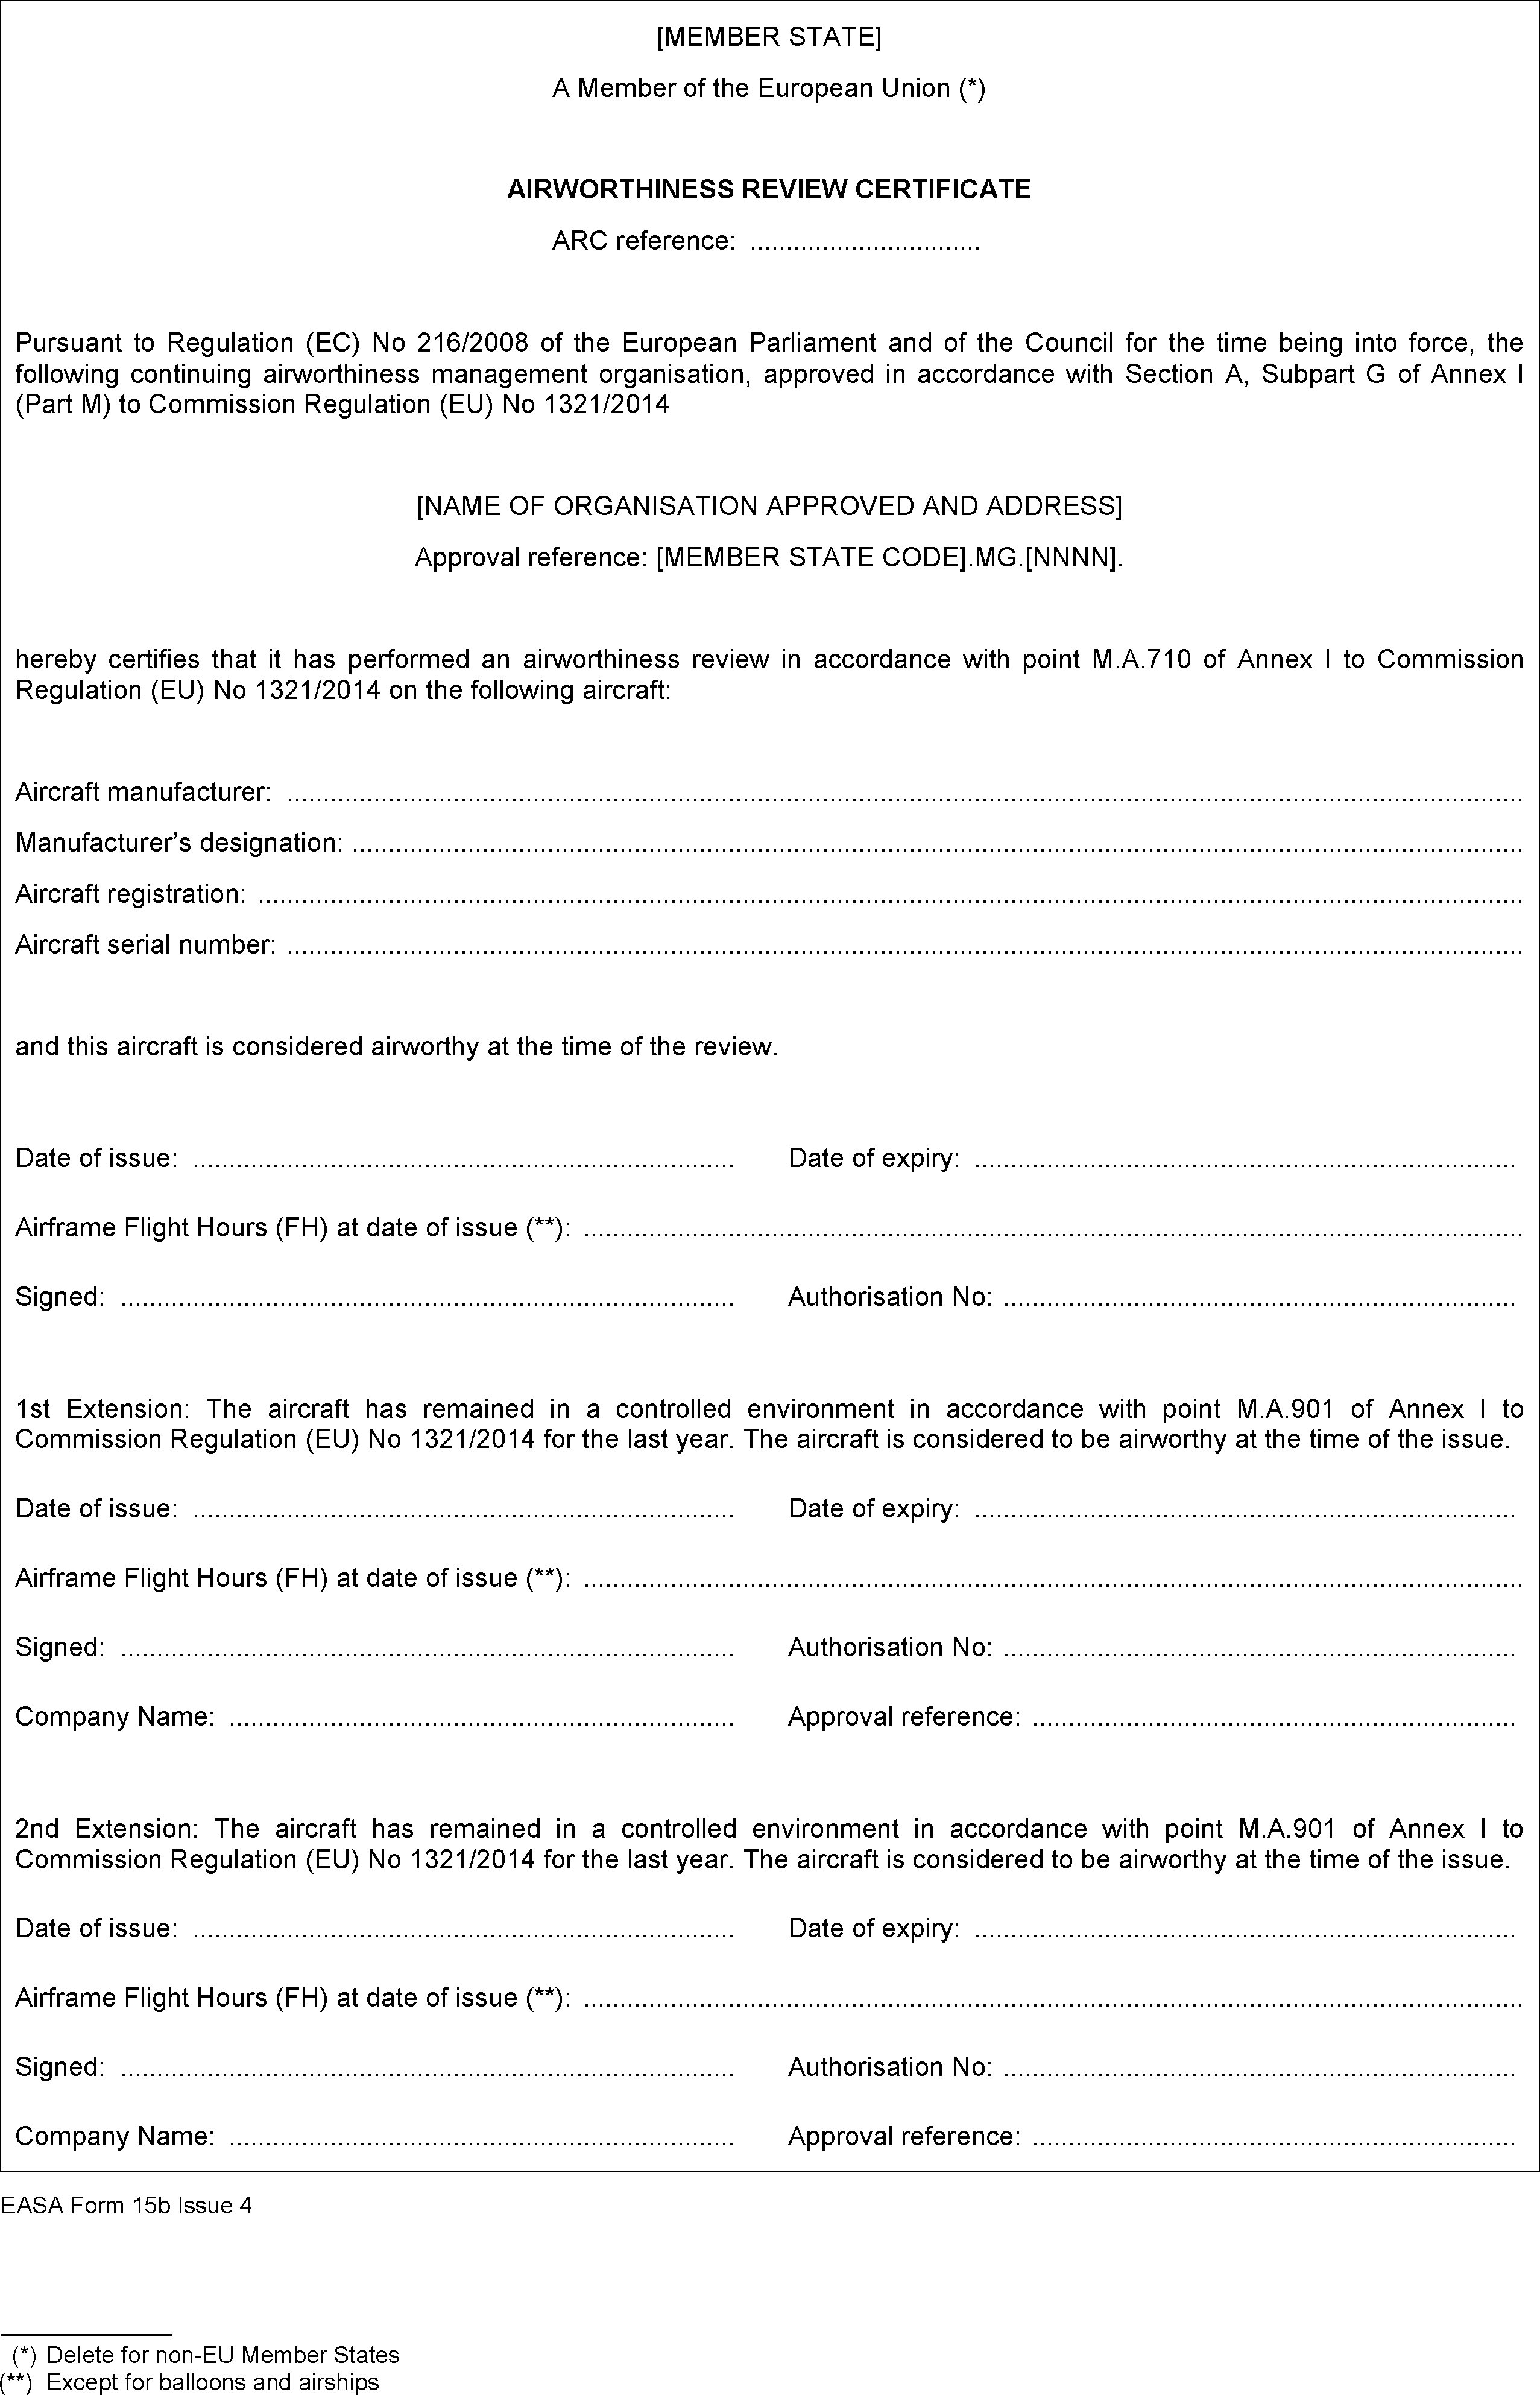 EUR-Lex - 02014R1321-20180905 - EN - EUR-Lex